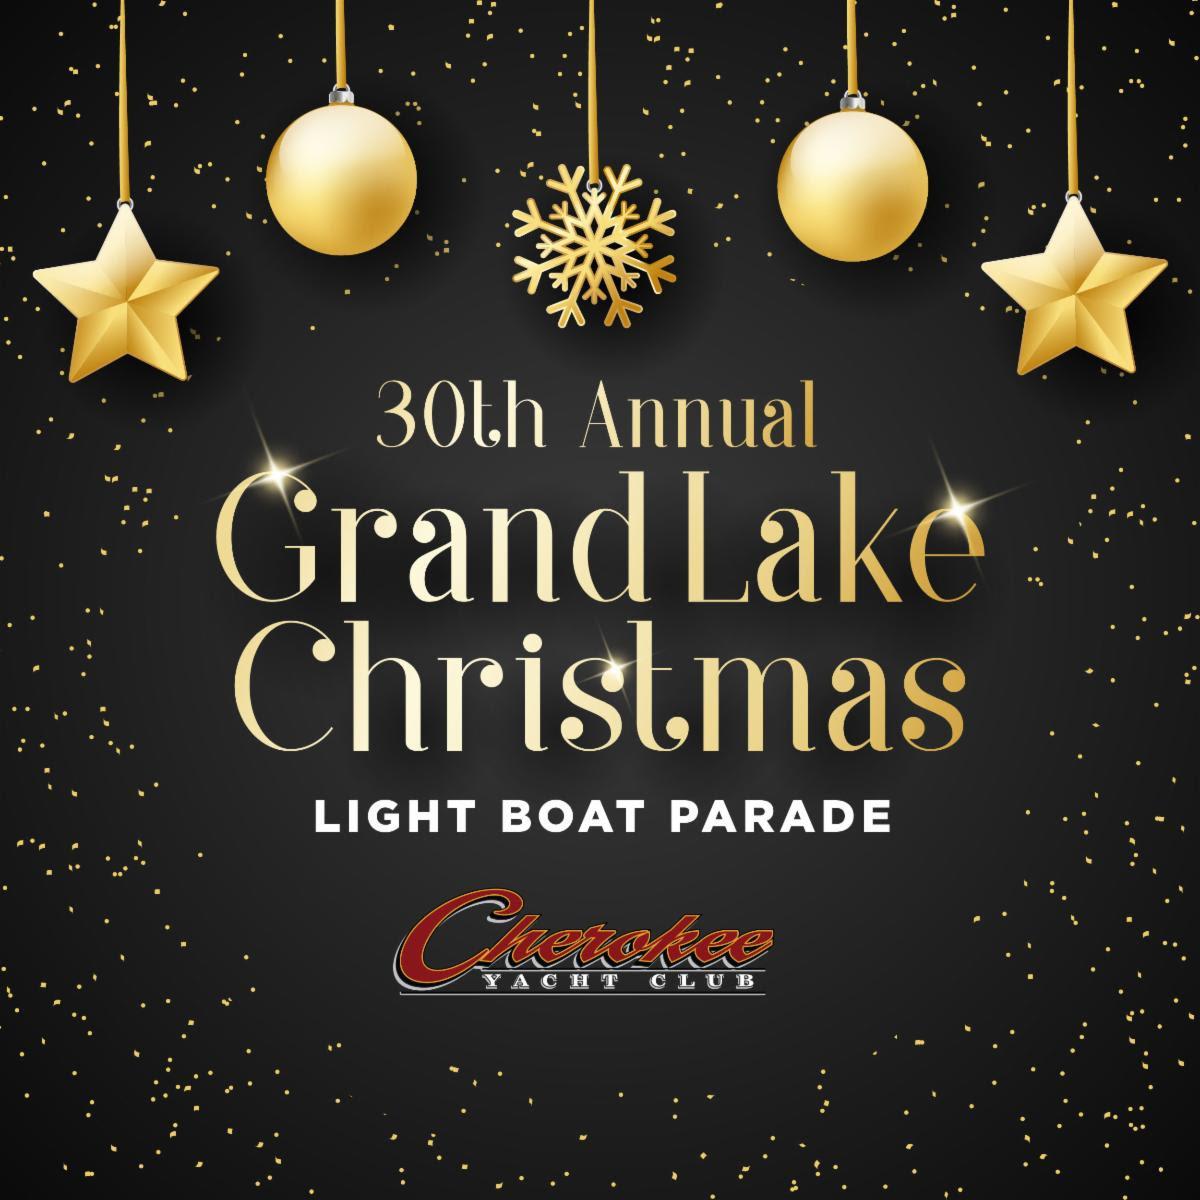 2019 Grand Lake Christmas Light Boat Parade